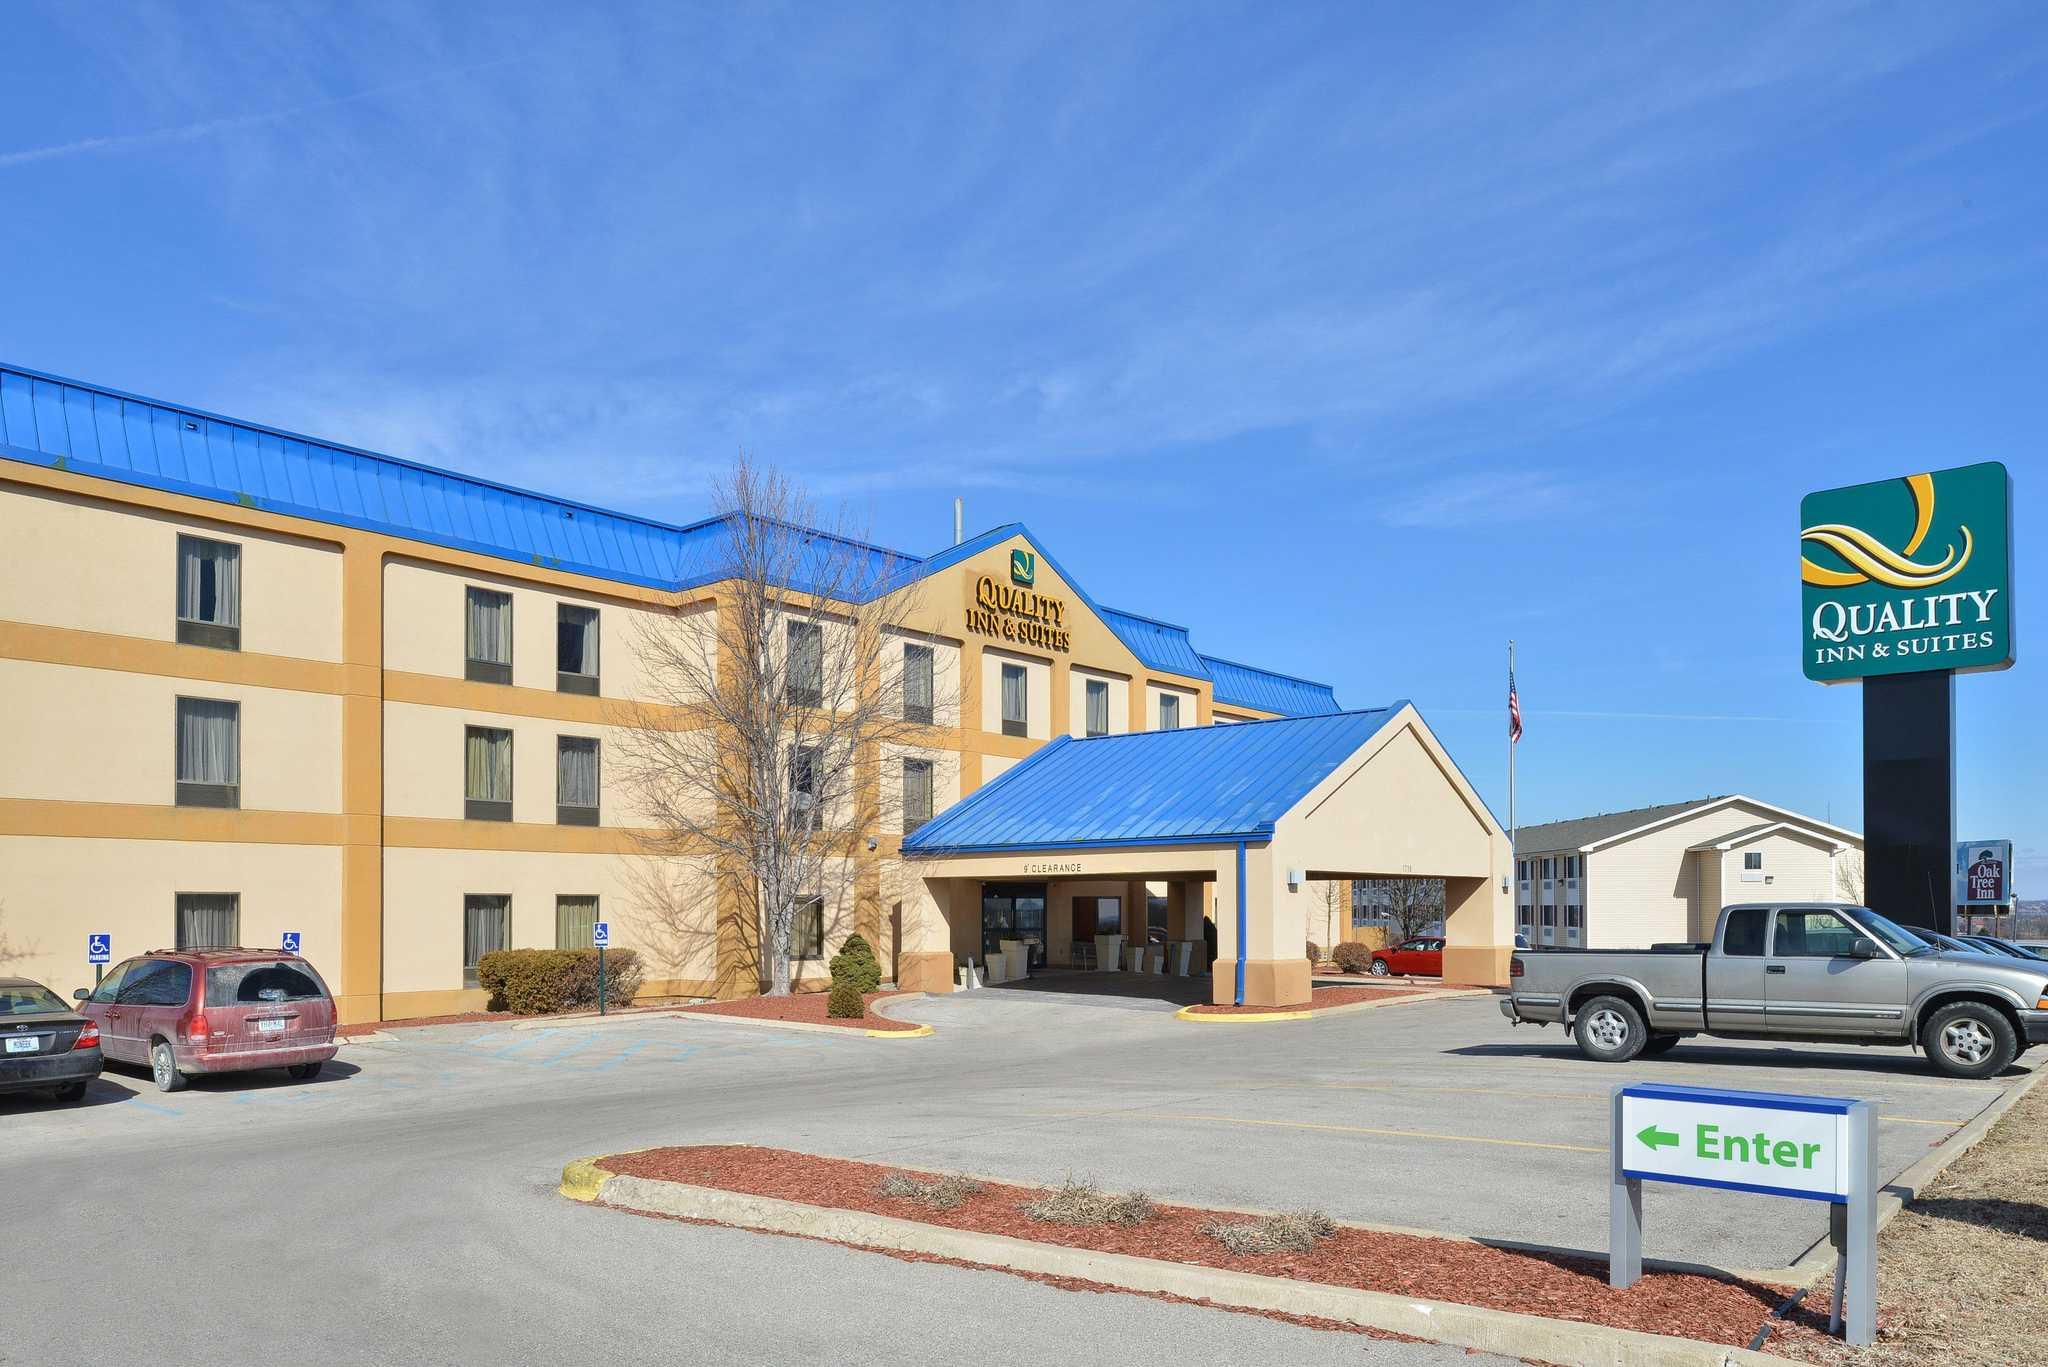 Quality Inn & Suites Jefferson City image 0